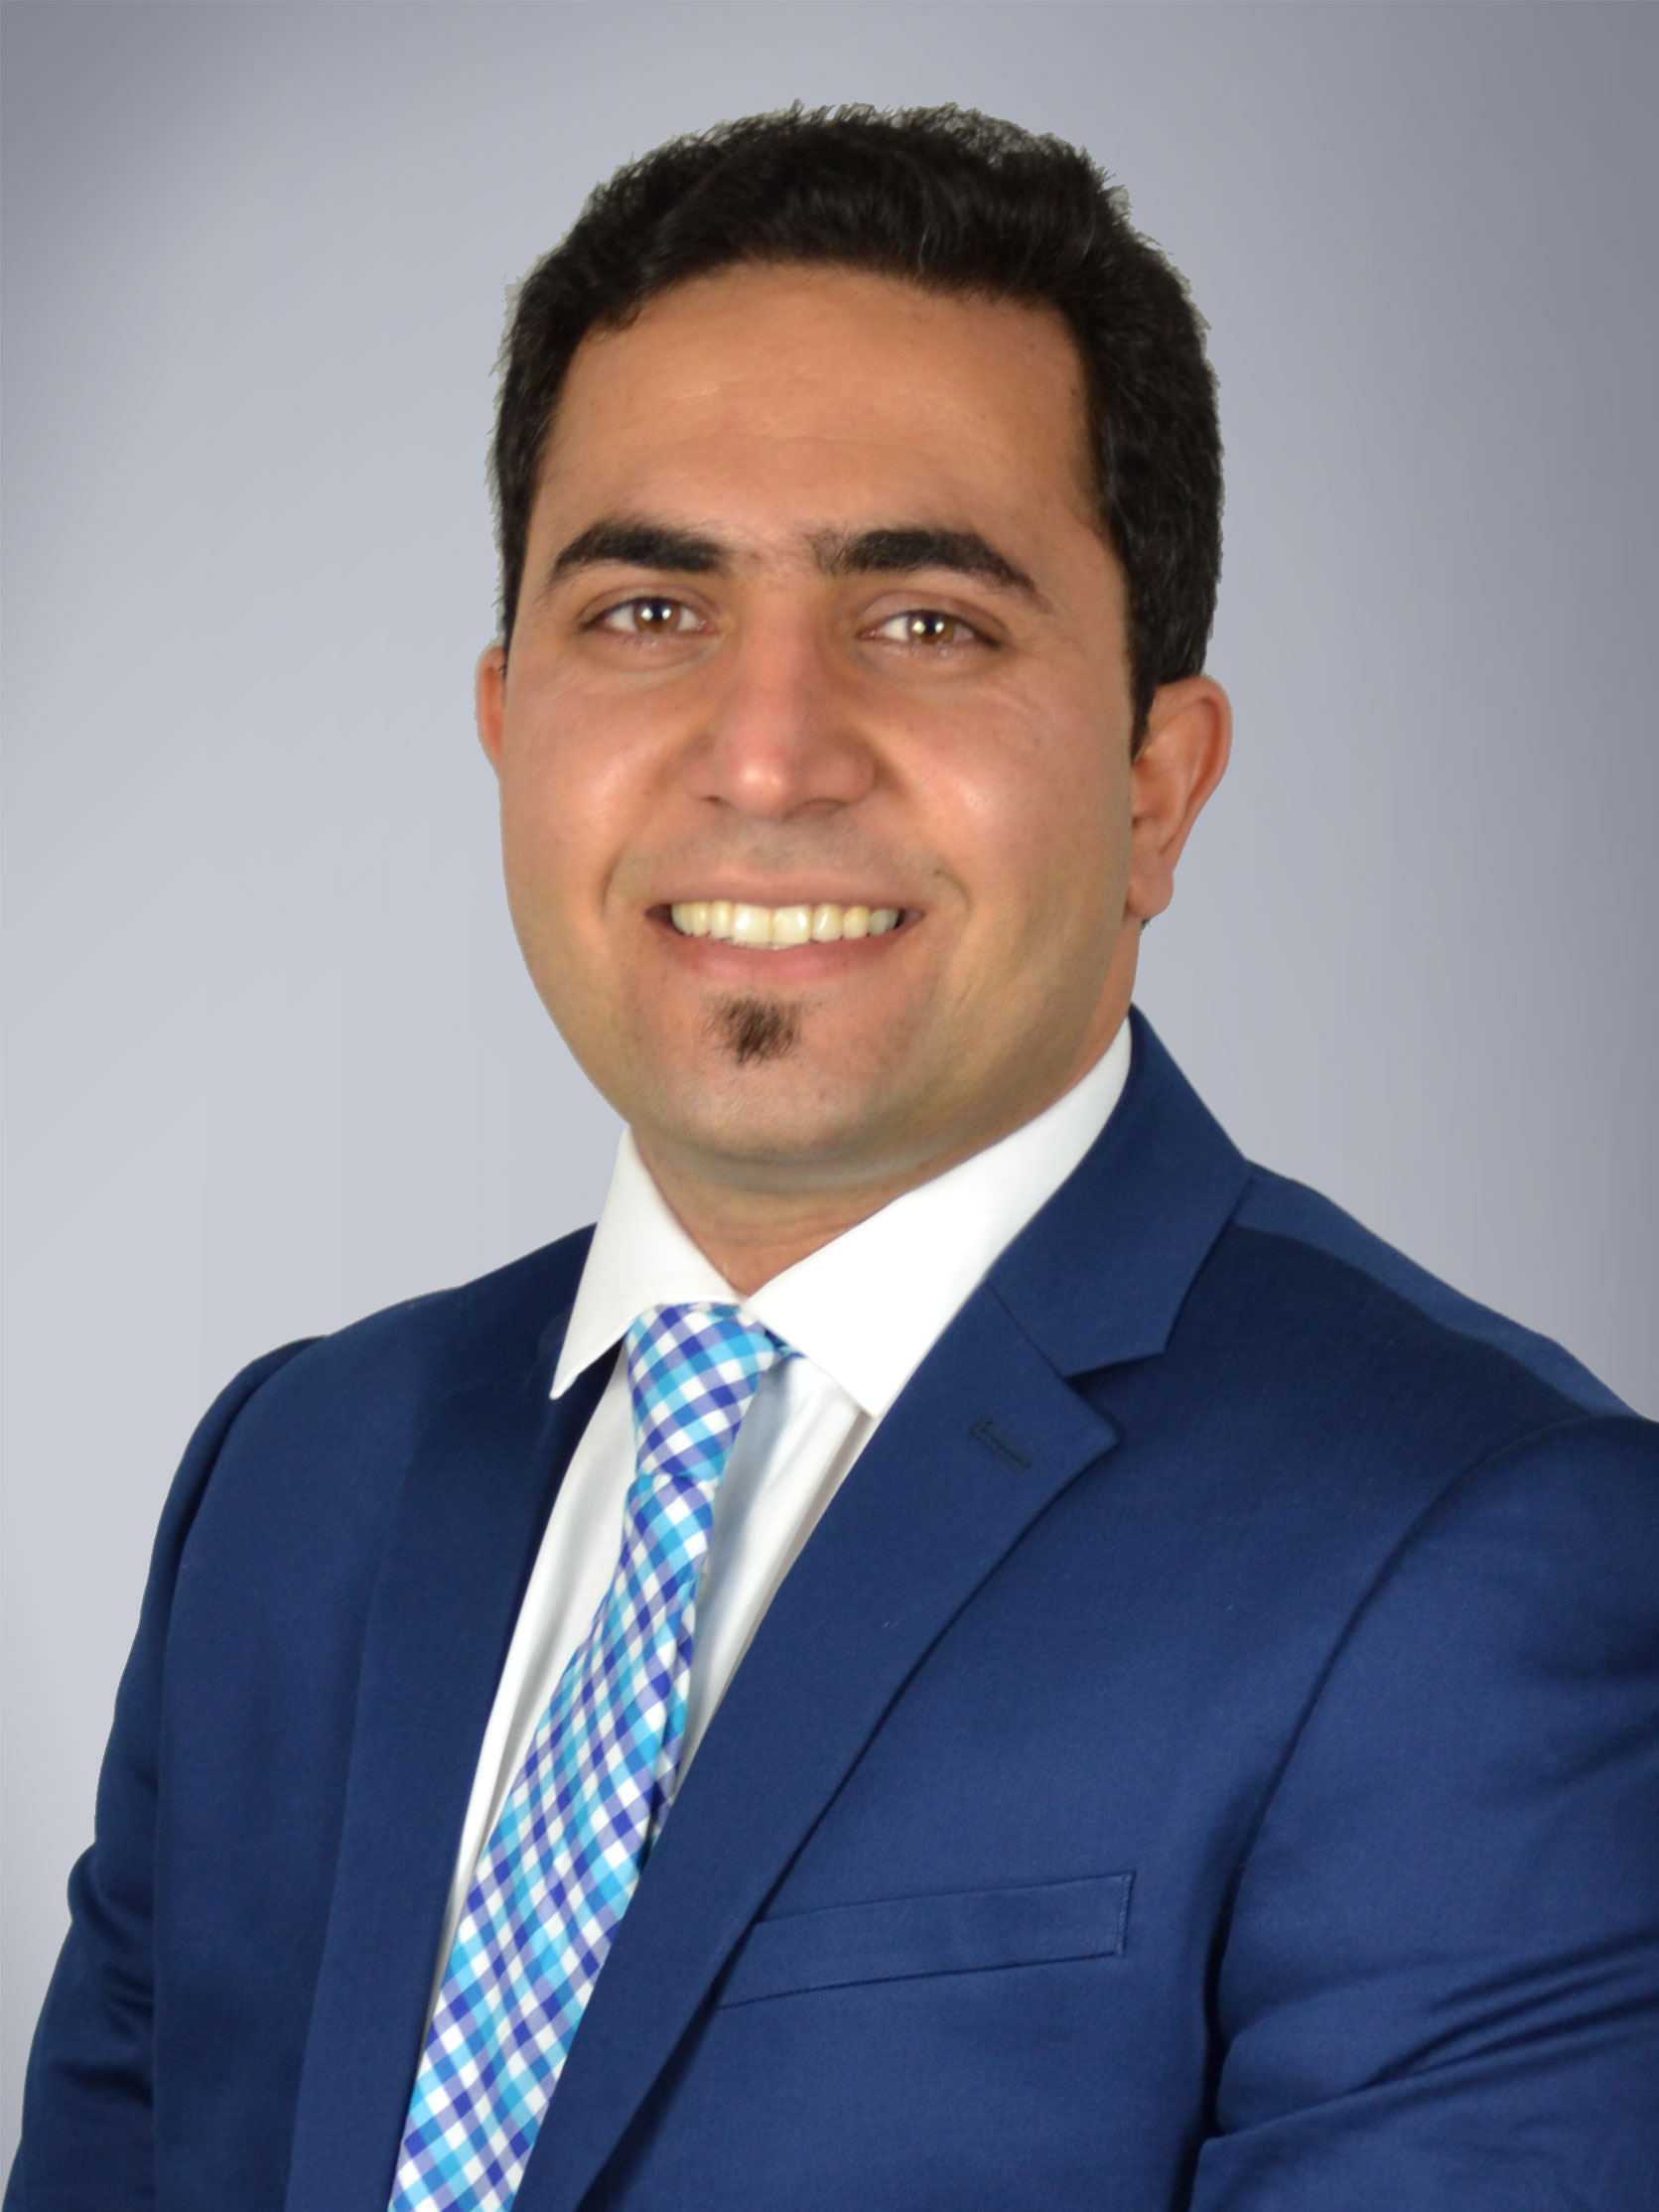 Mohammad Dehghani